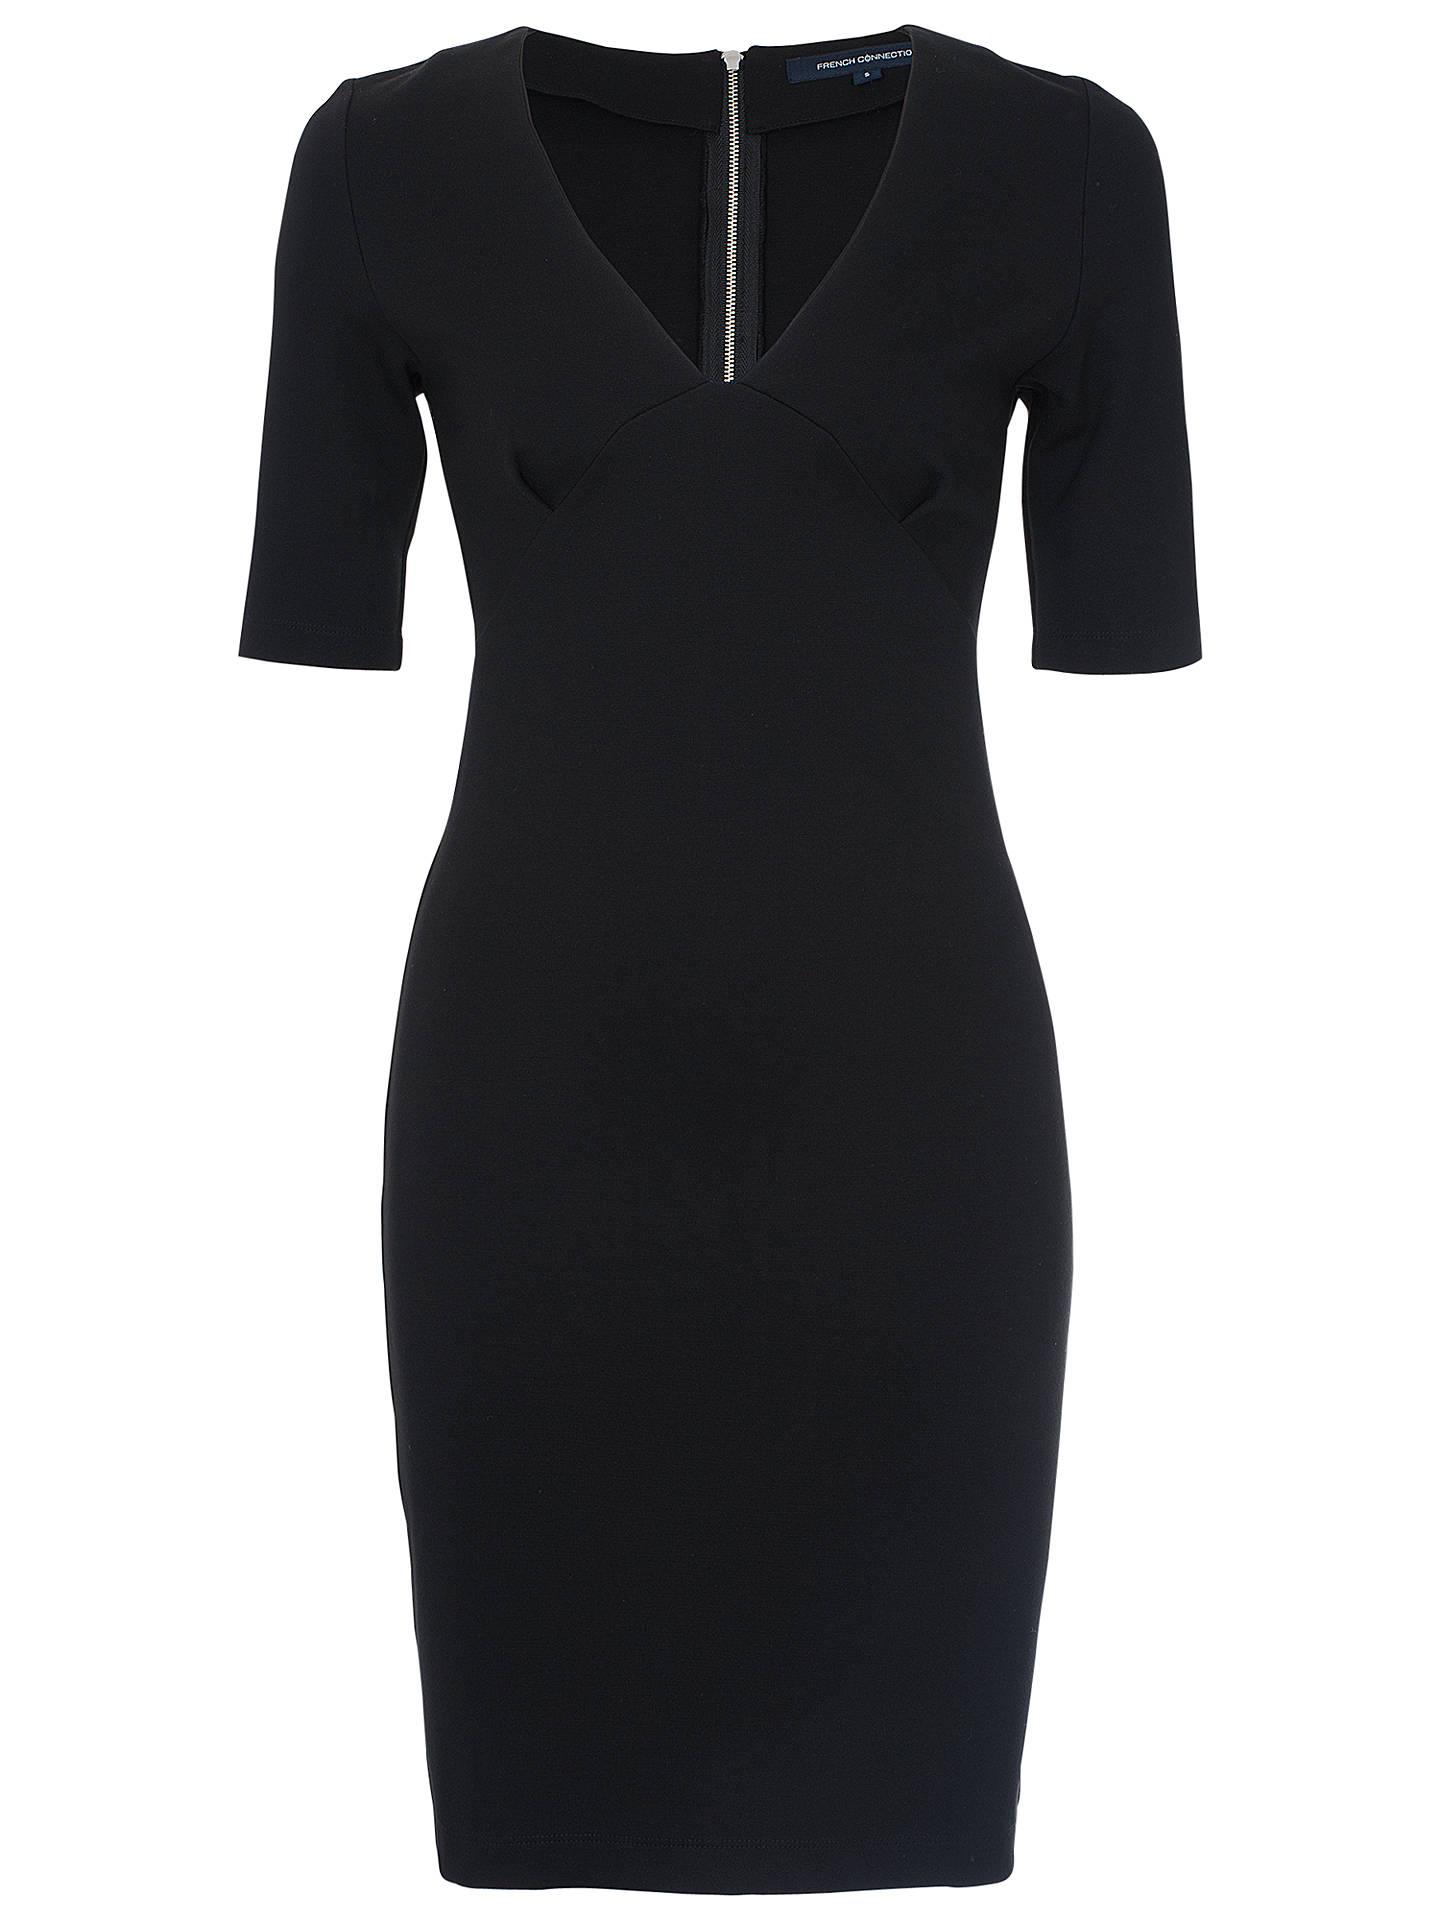 4e5751e9cb2 Buy French Connection Lula Stretch V-Neck Dress